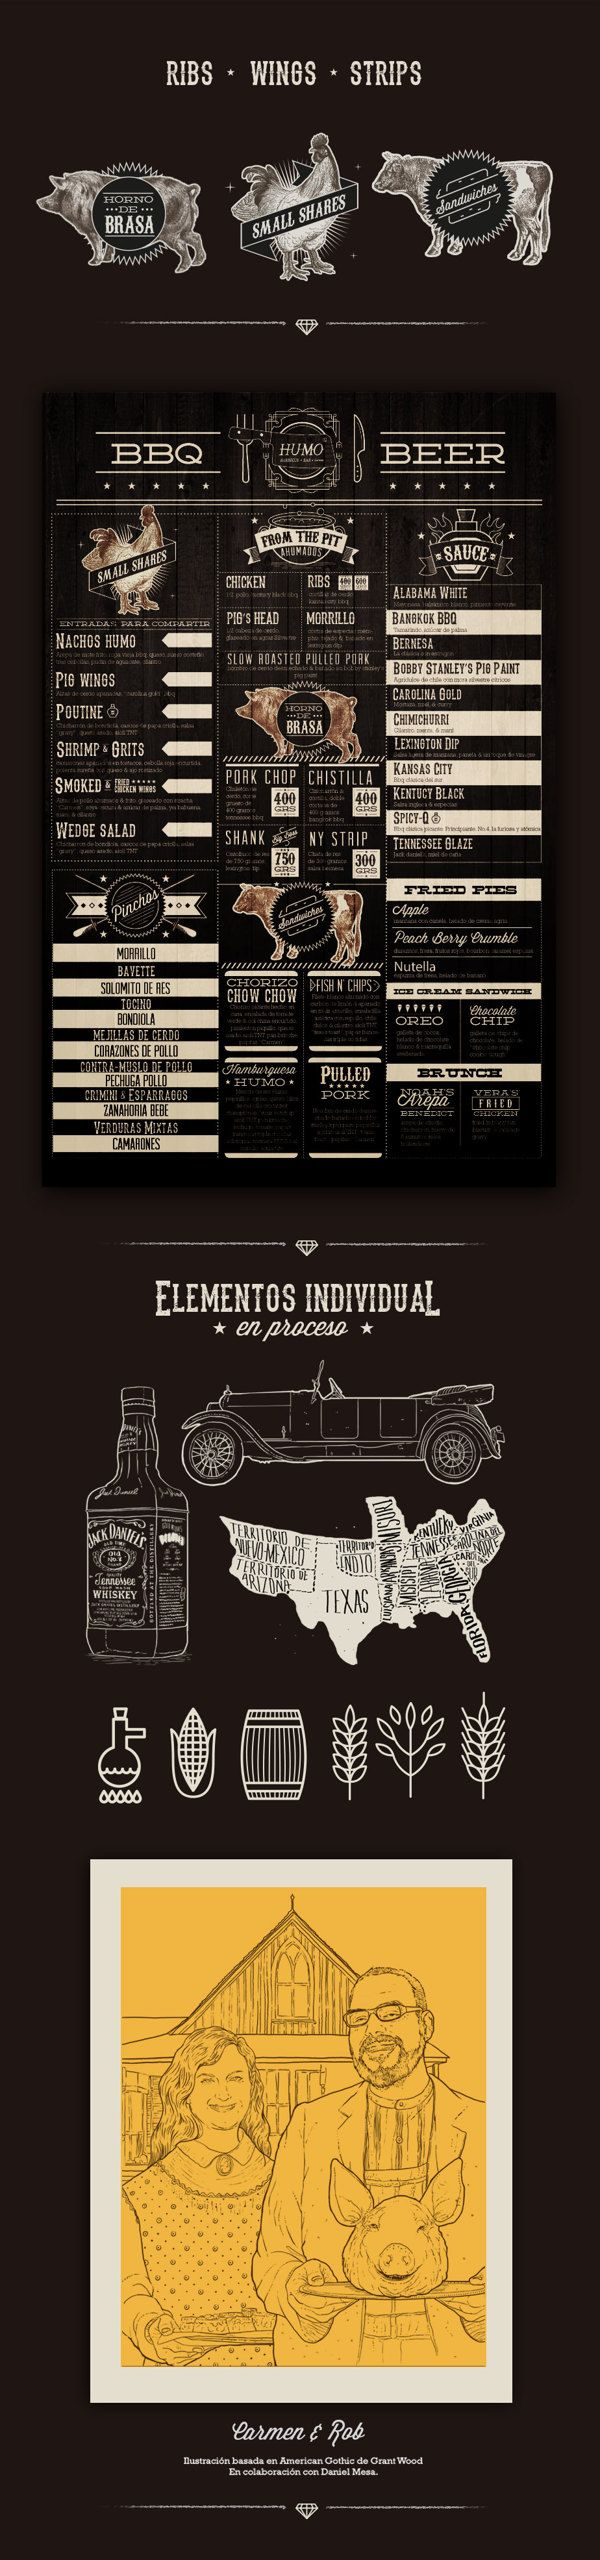 pinterest.com/fra411 #visual #identity - Southern BBQ / Mateo Rios